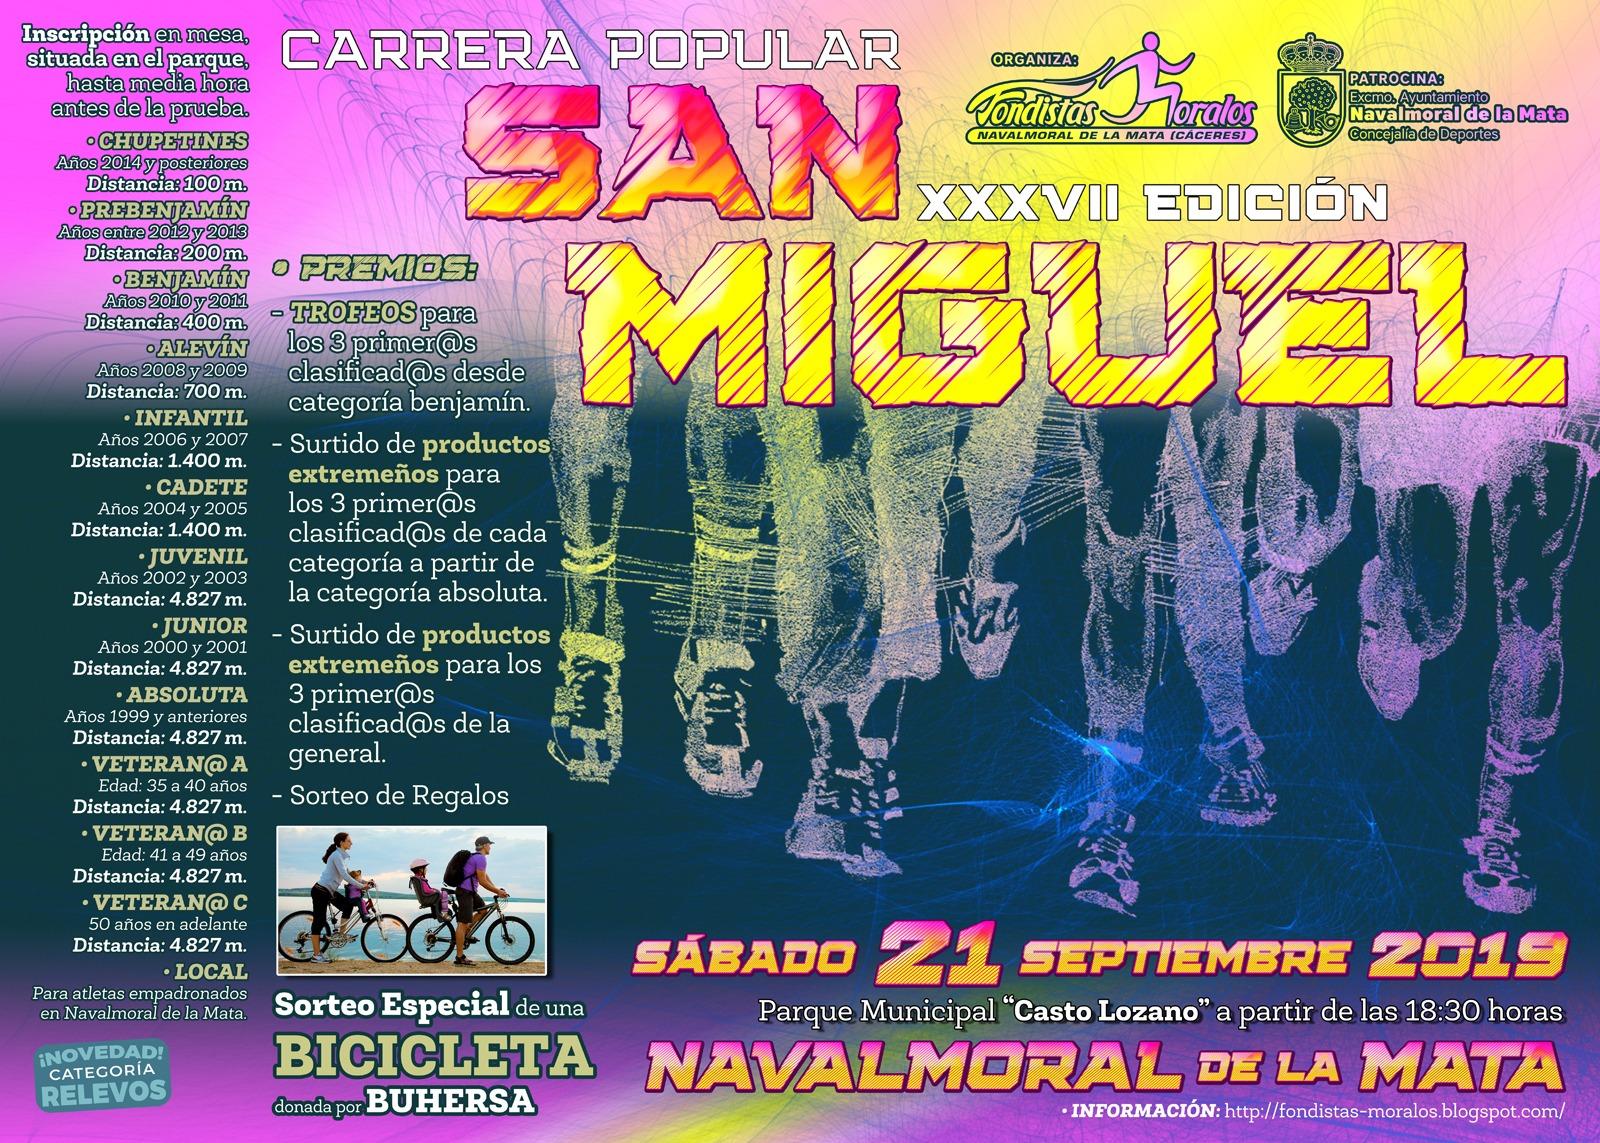 Carrera popular San Miguel 2019